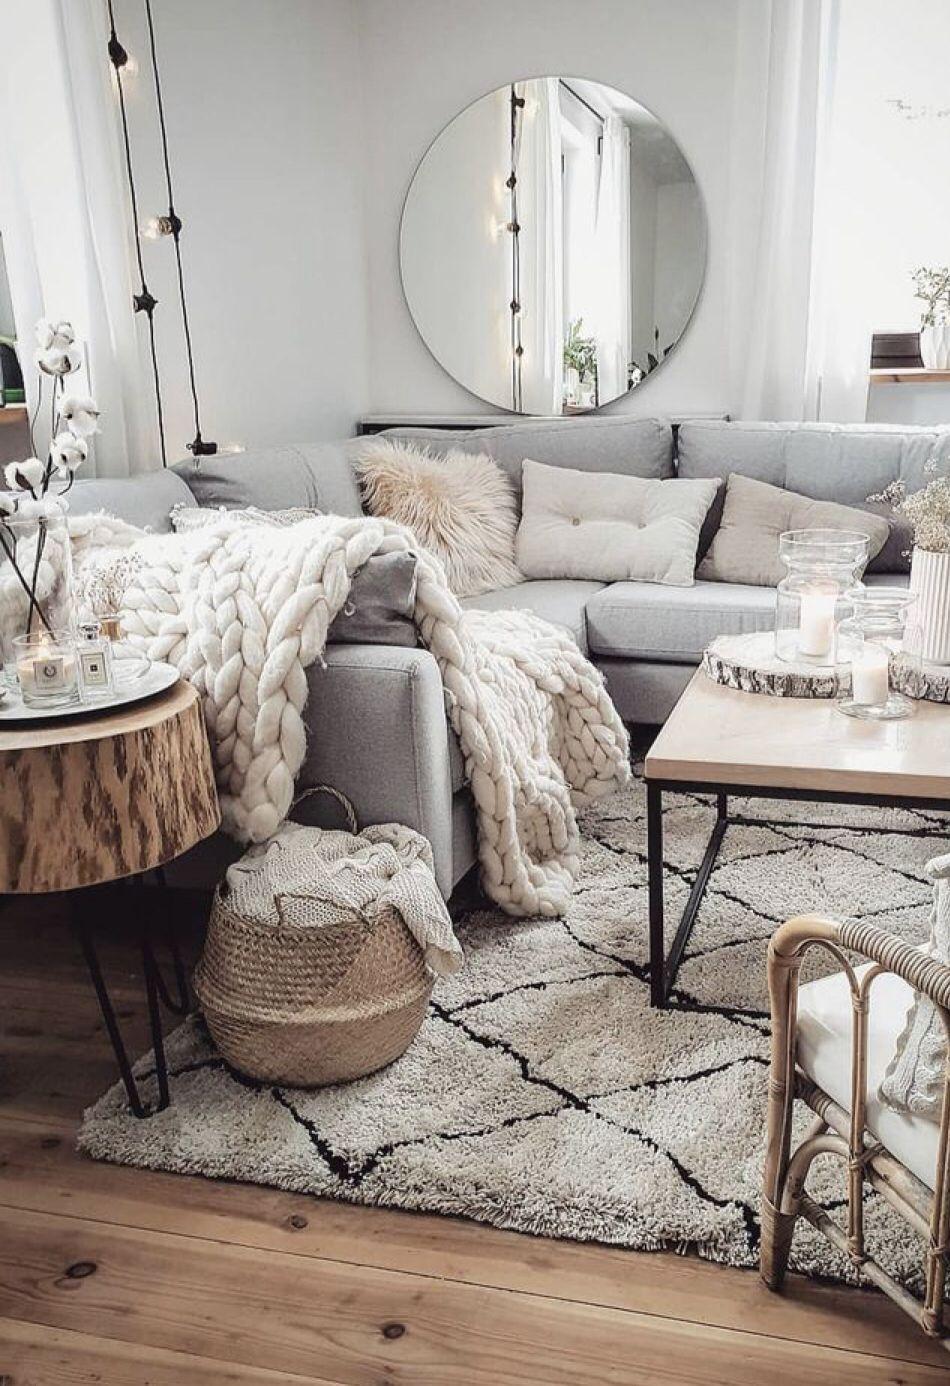 Minimalism Living Room Design Inspiration Living Room Decor Cozy Living Room Scandinavian Home Living Room